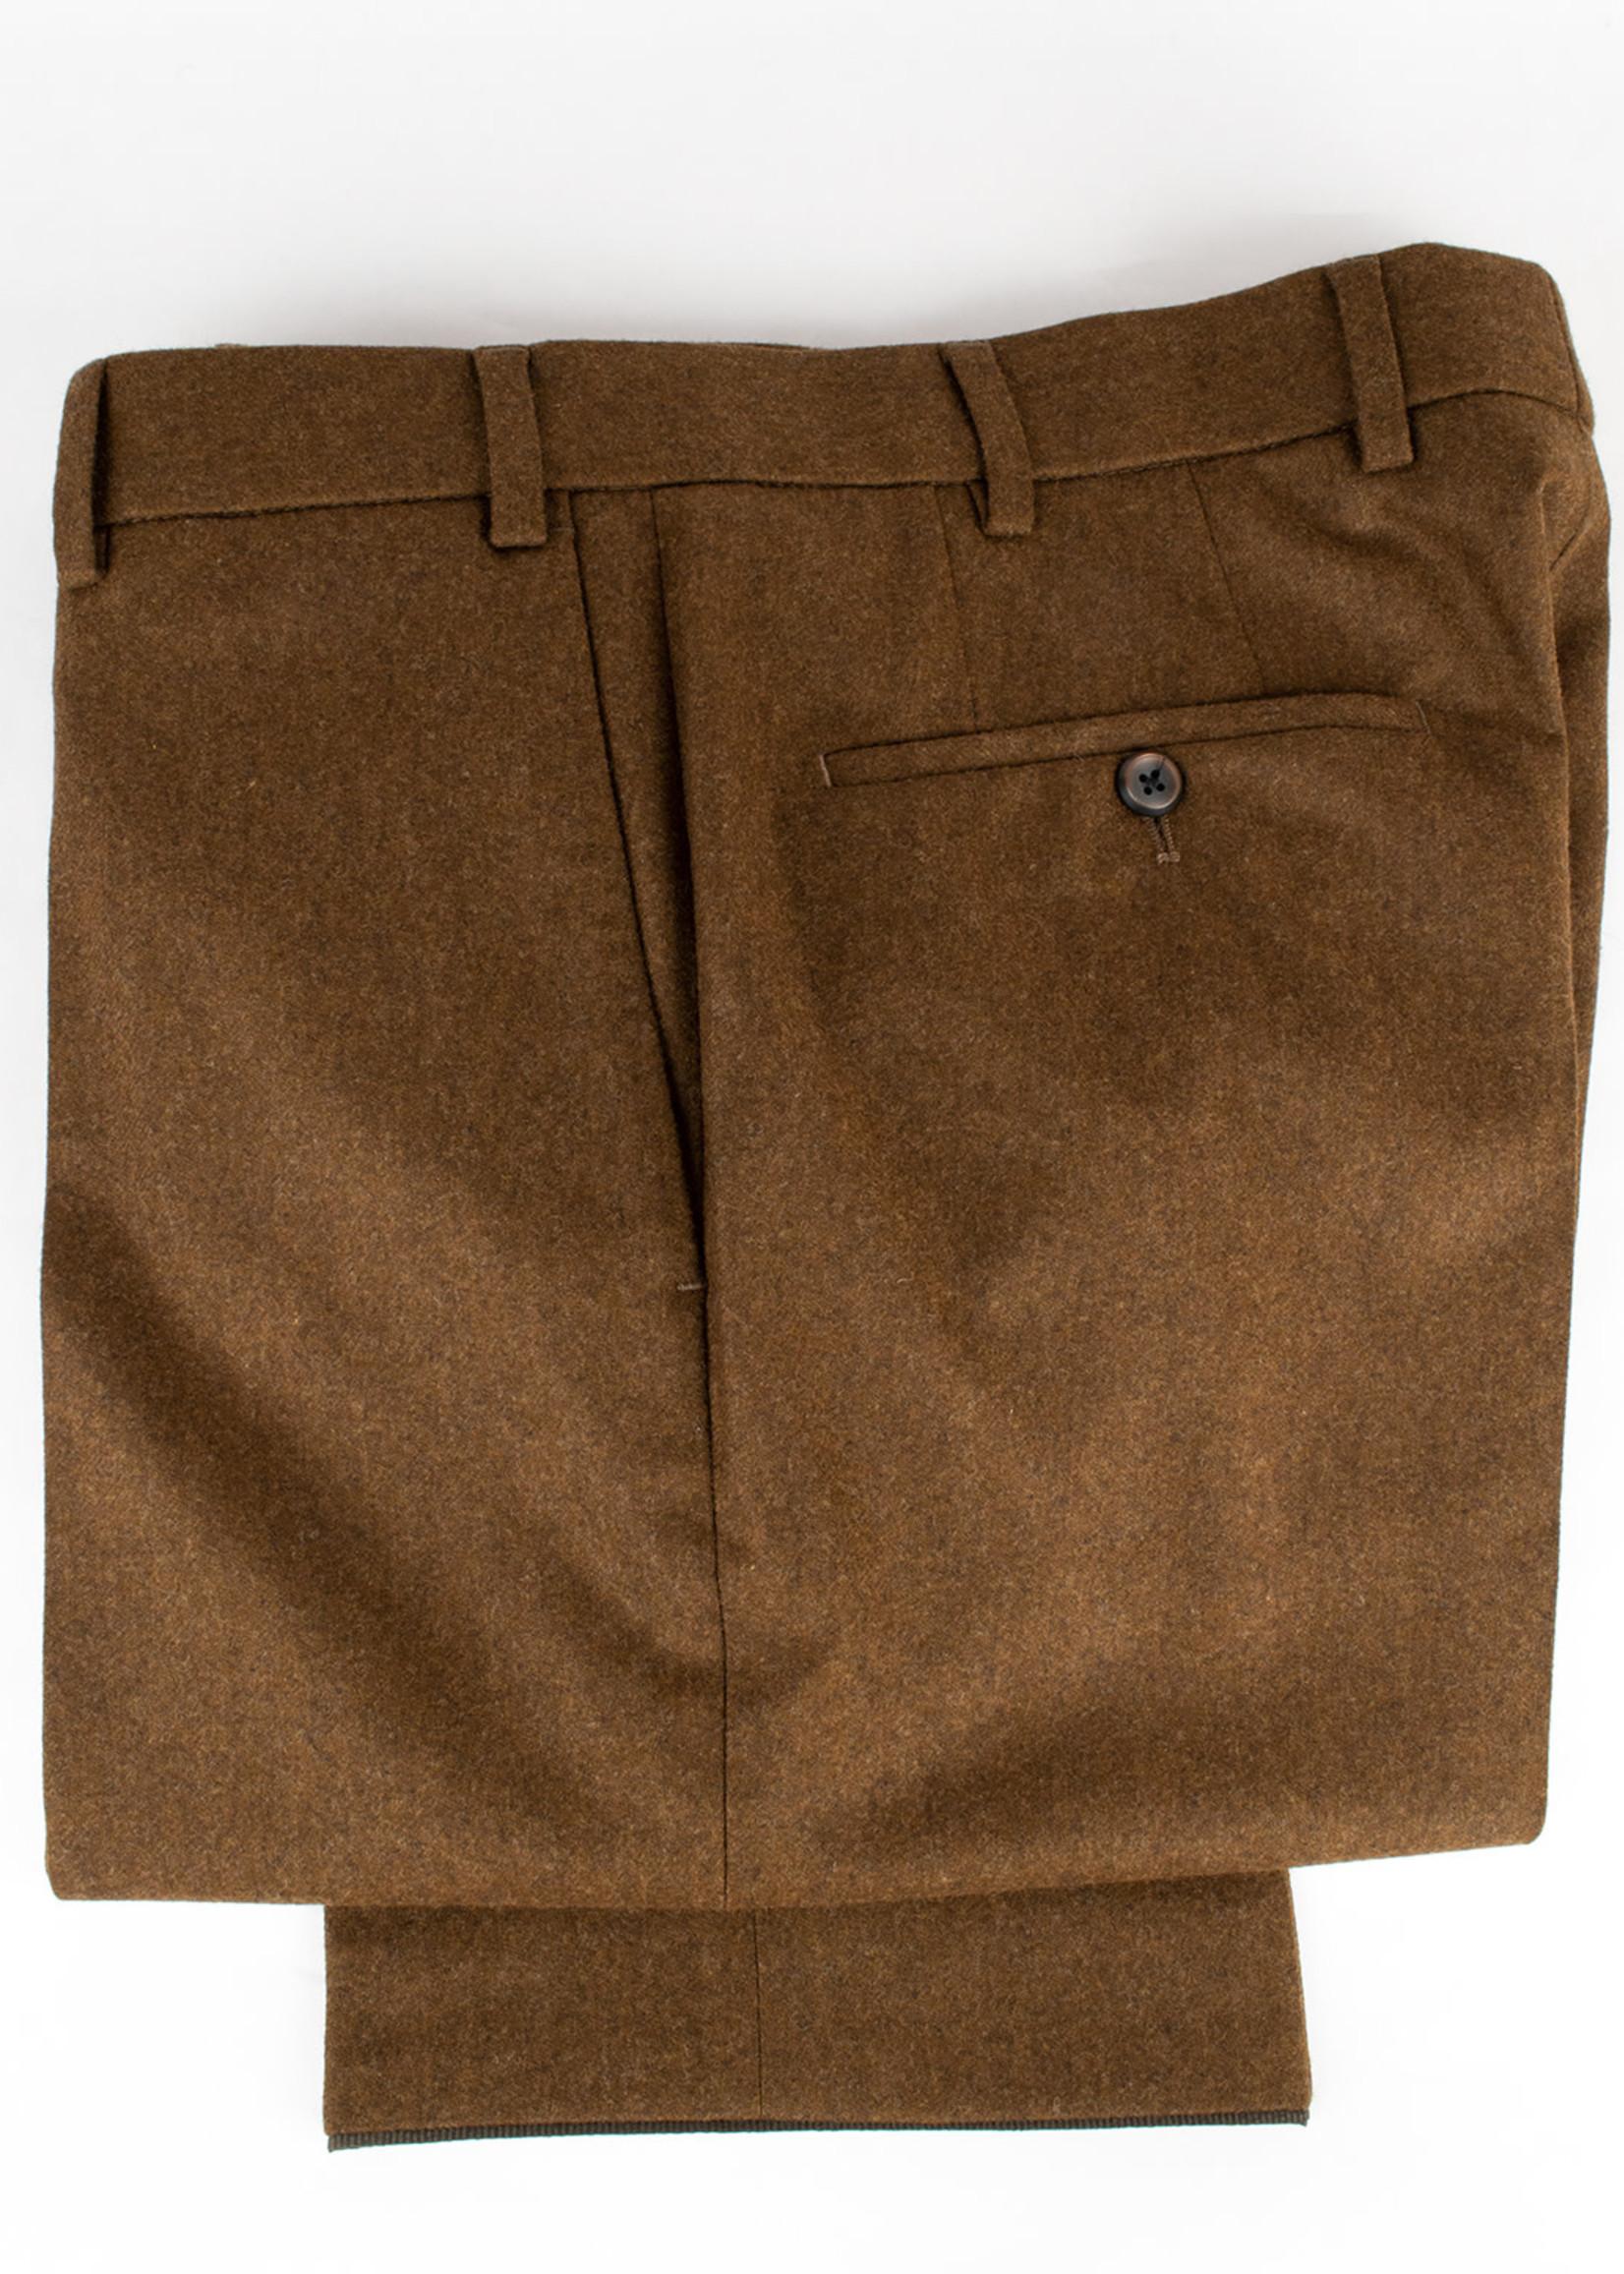 Hiltl Hiltl Piacenza Pant Rust Carded Woolen Flannel